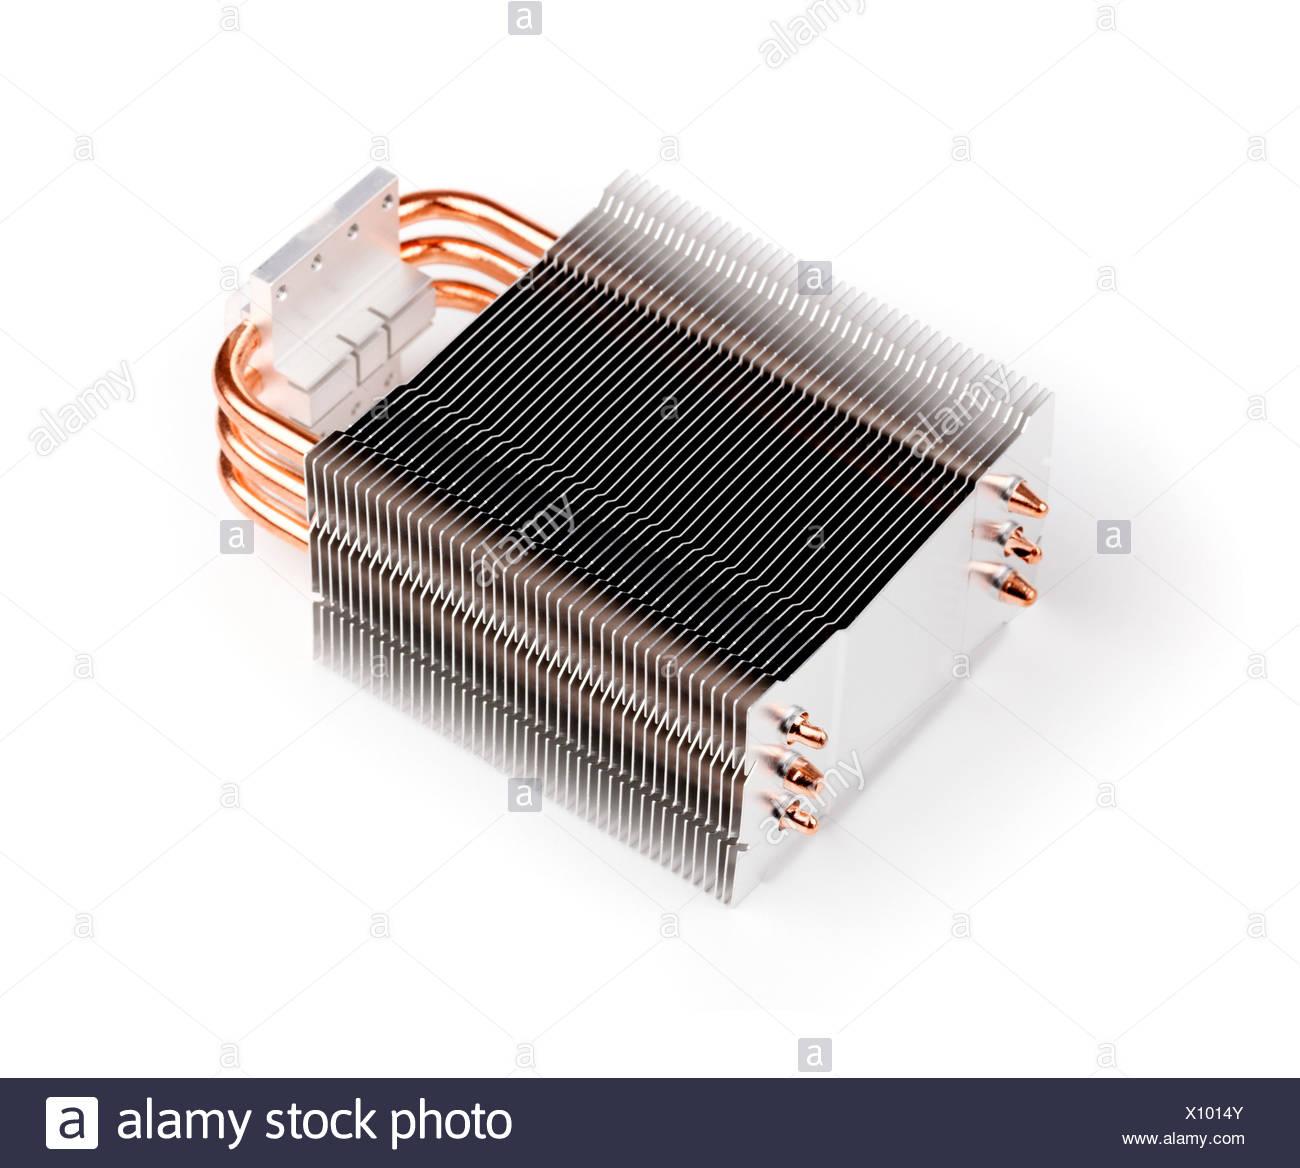 CPU cooler - Stock Image